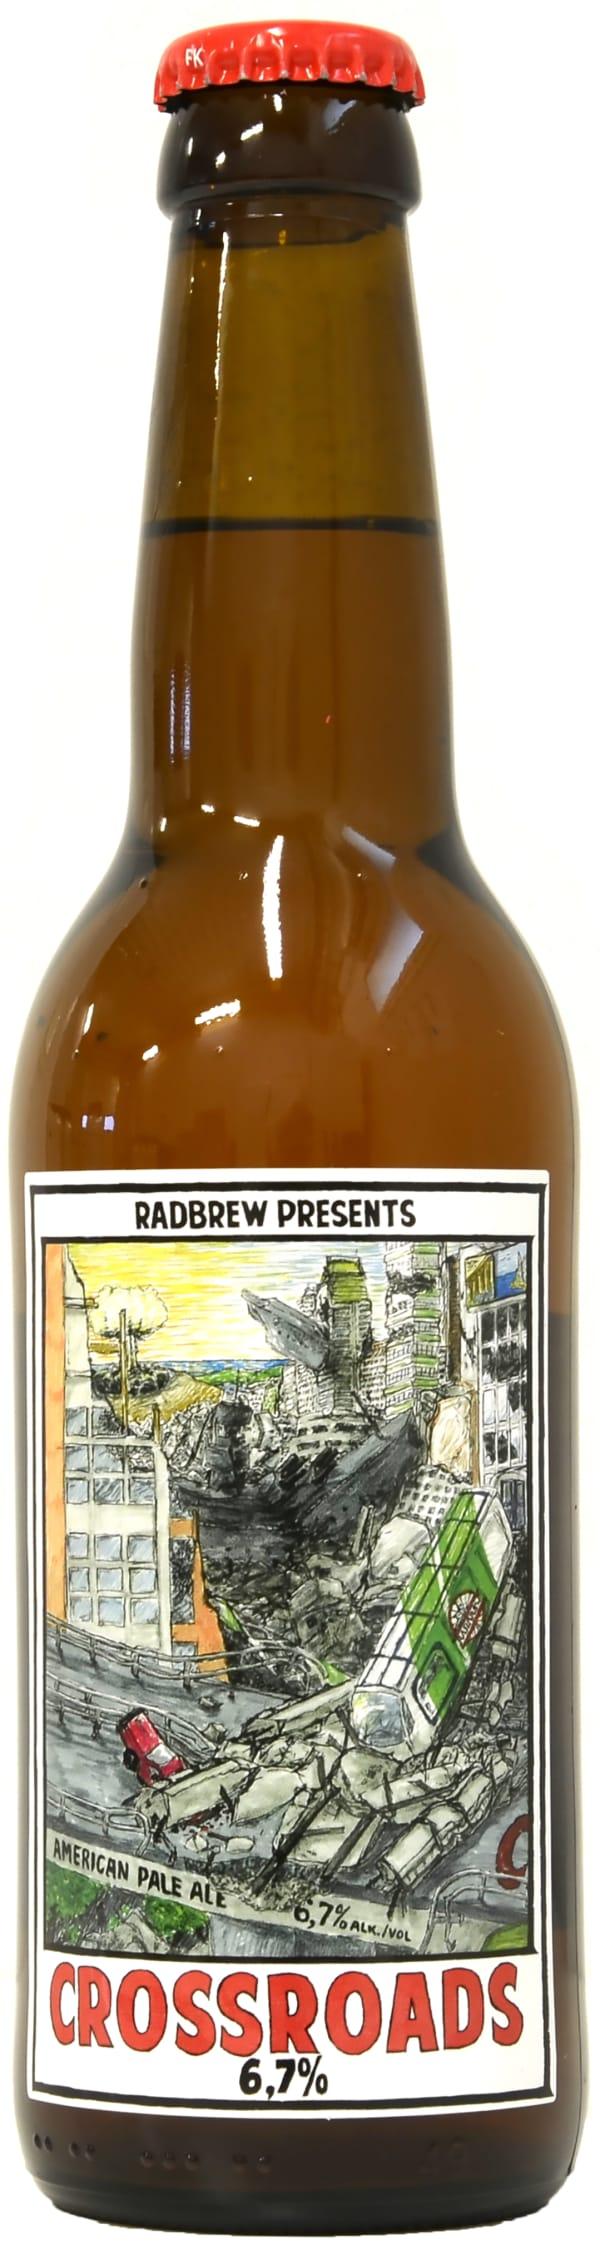 Radbrew Crossroads